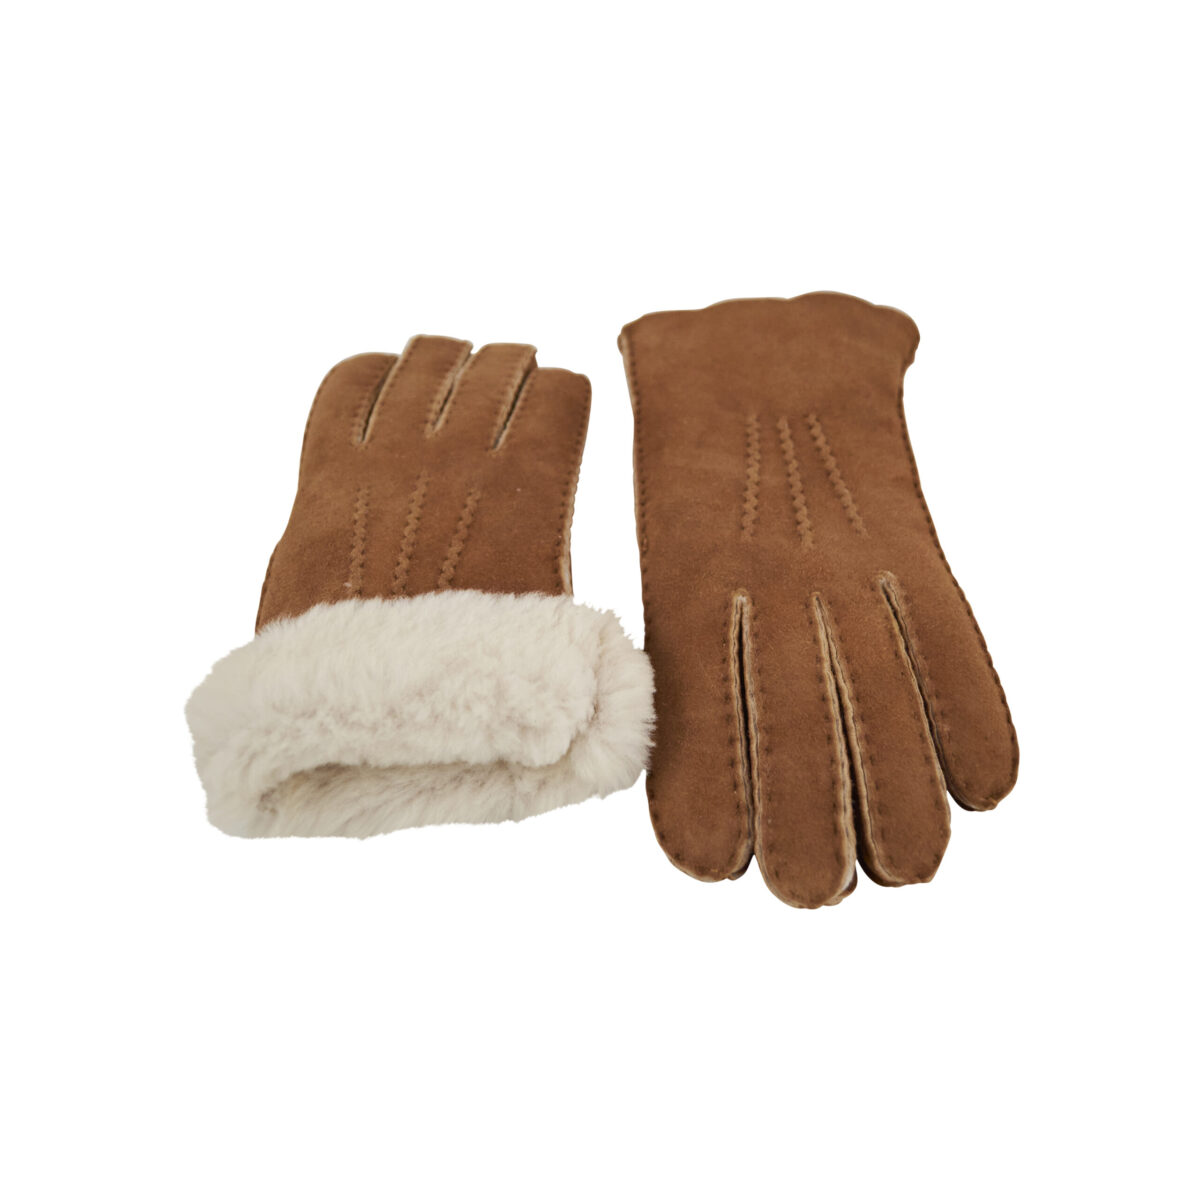 Handsker i cognacfarvet rulam - fås i flere størrelser